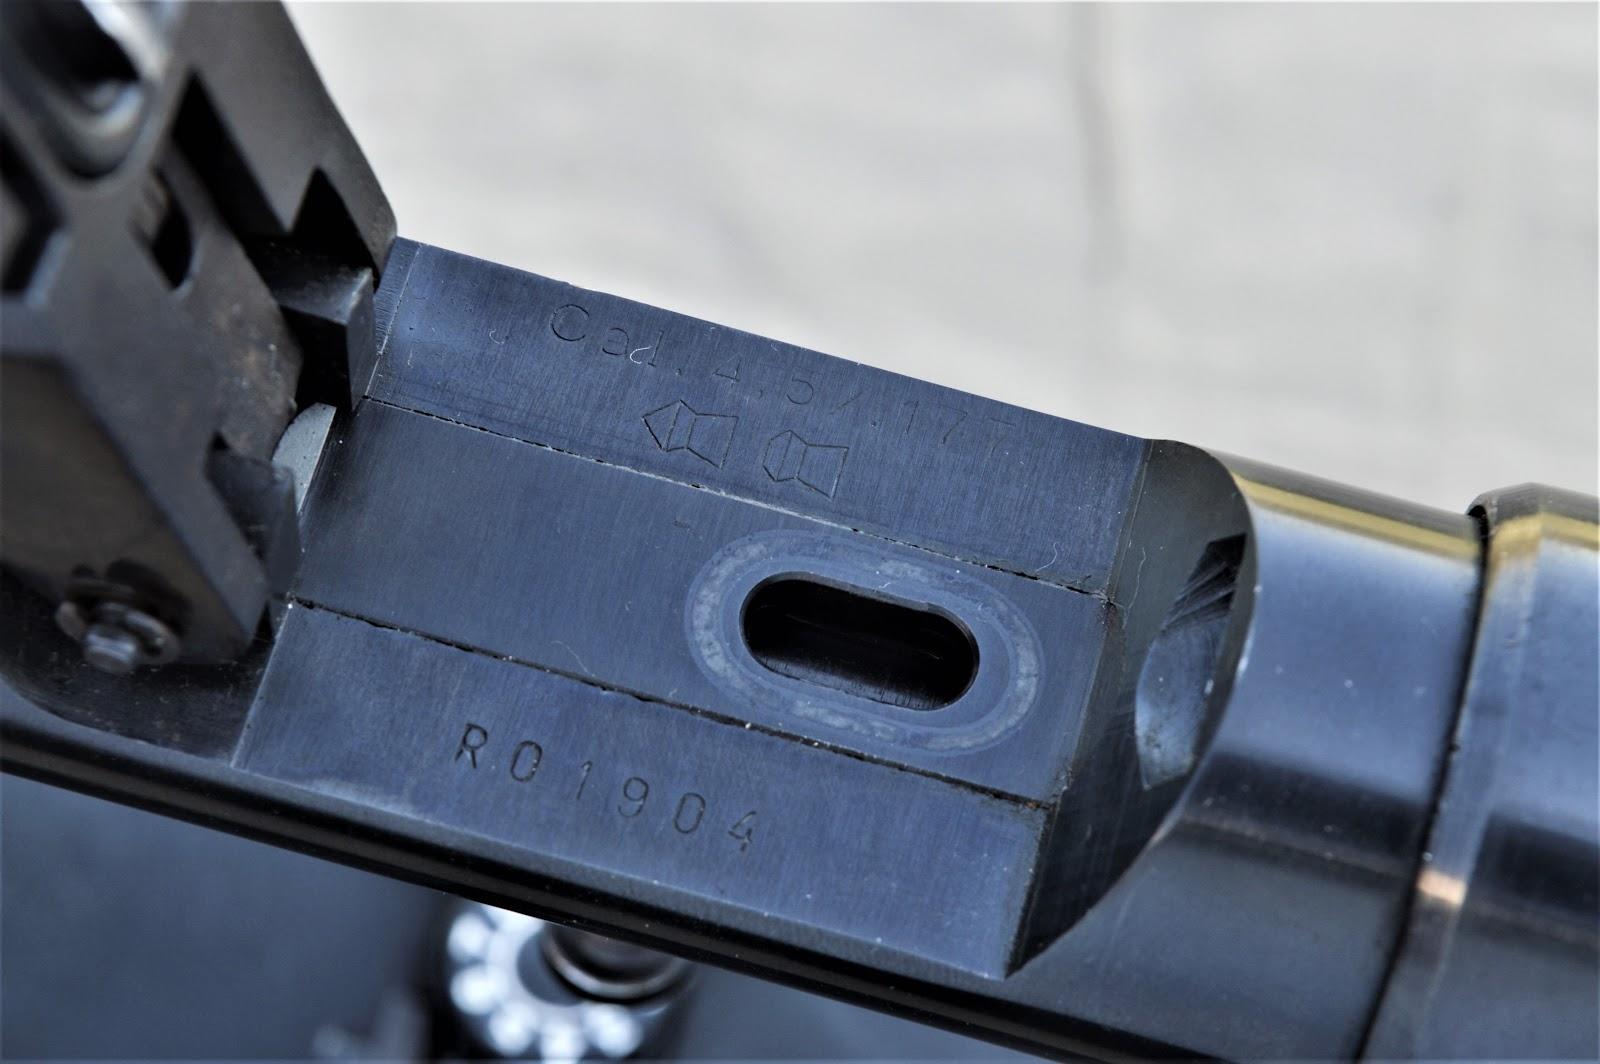 Lozenge shaped pellet entry